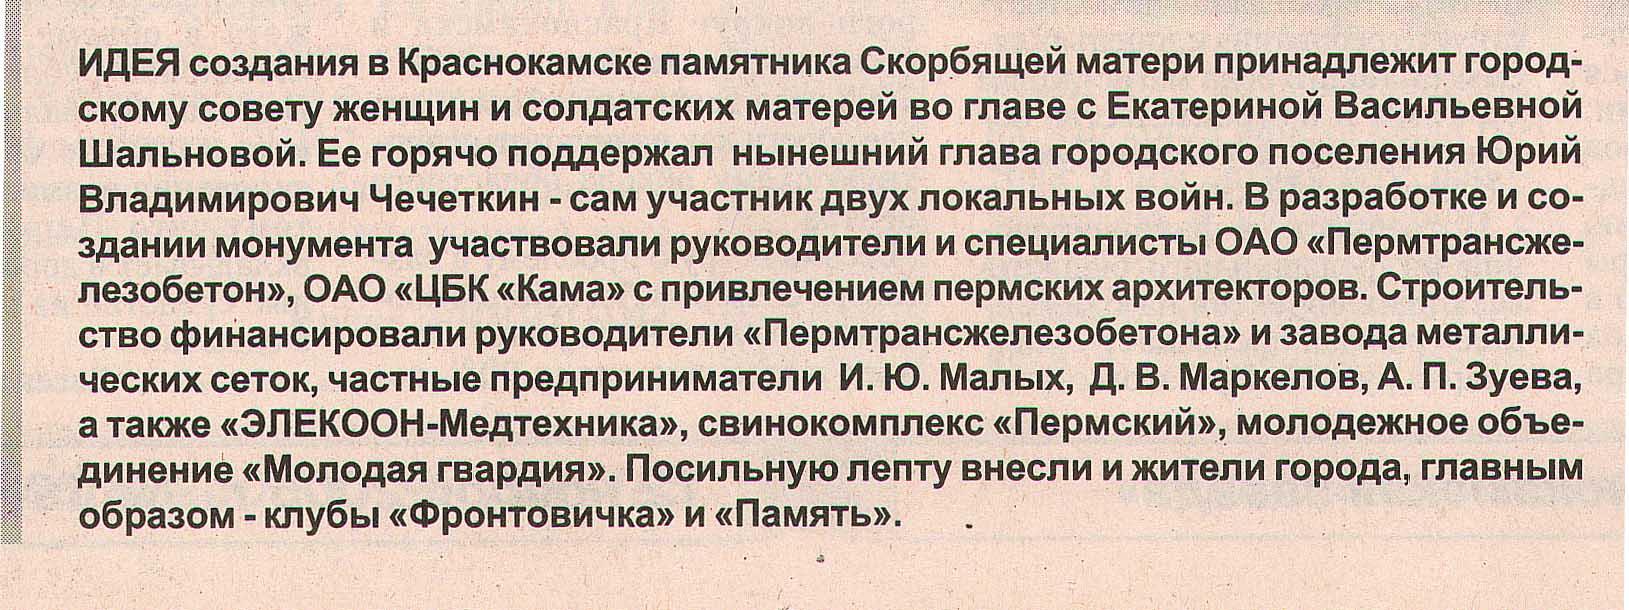 "Газета ""Краснокамская звезда"" от 12.11.2005 №193-195 Ф.57.Оп.1.Д.254.Л.145"